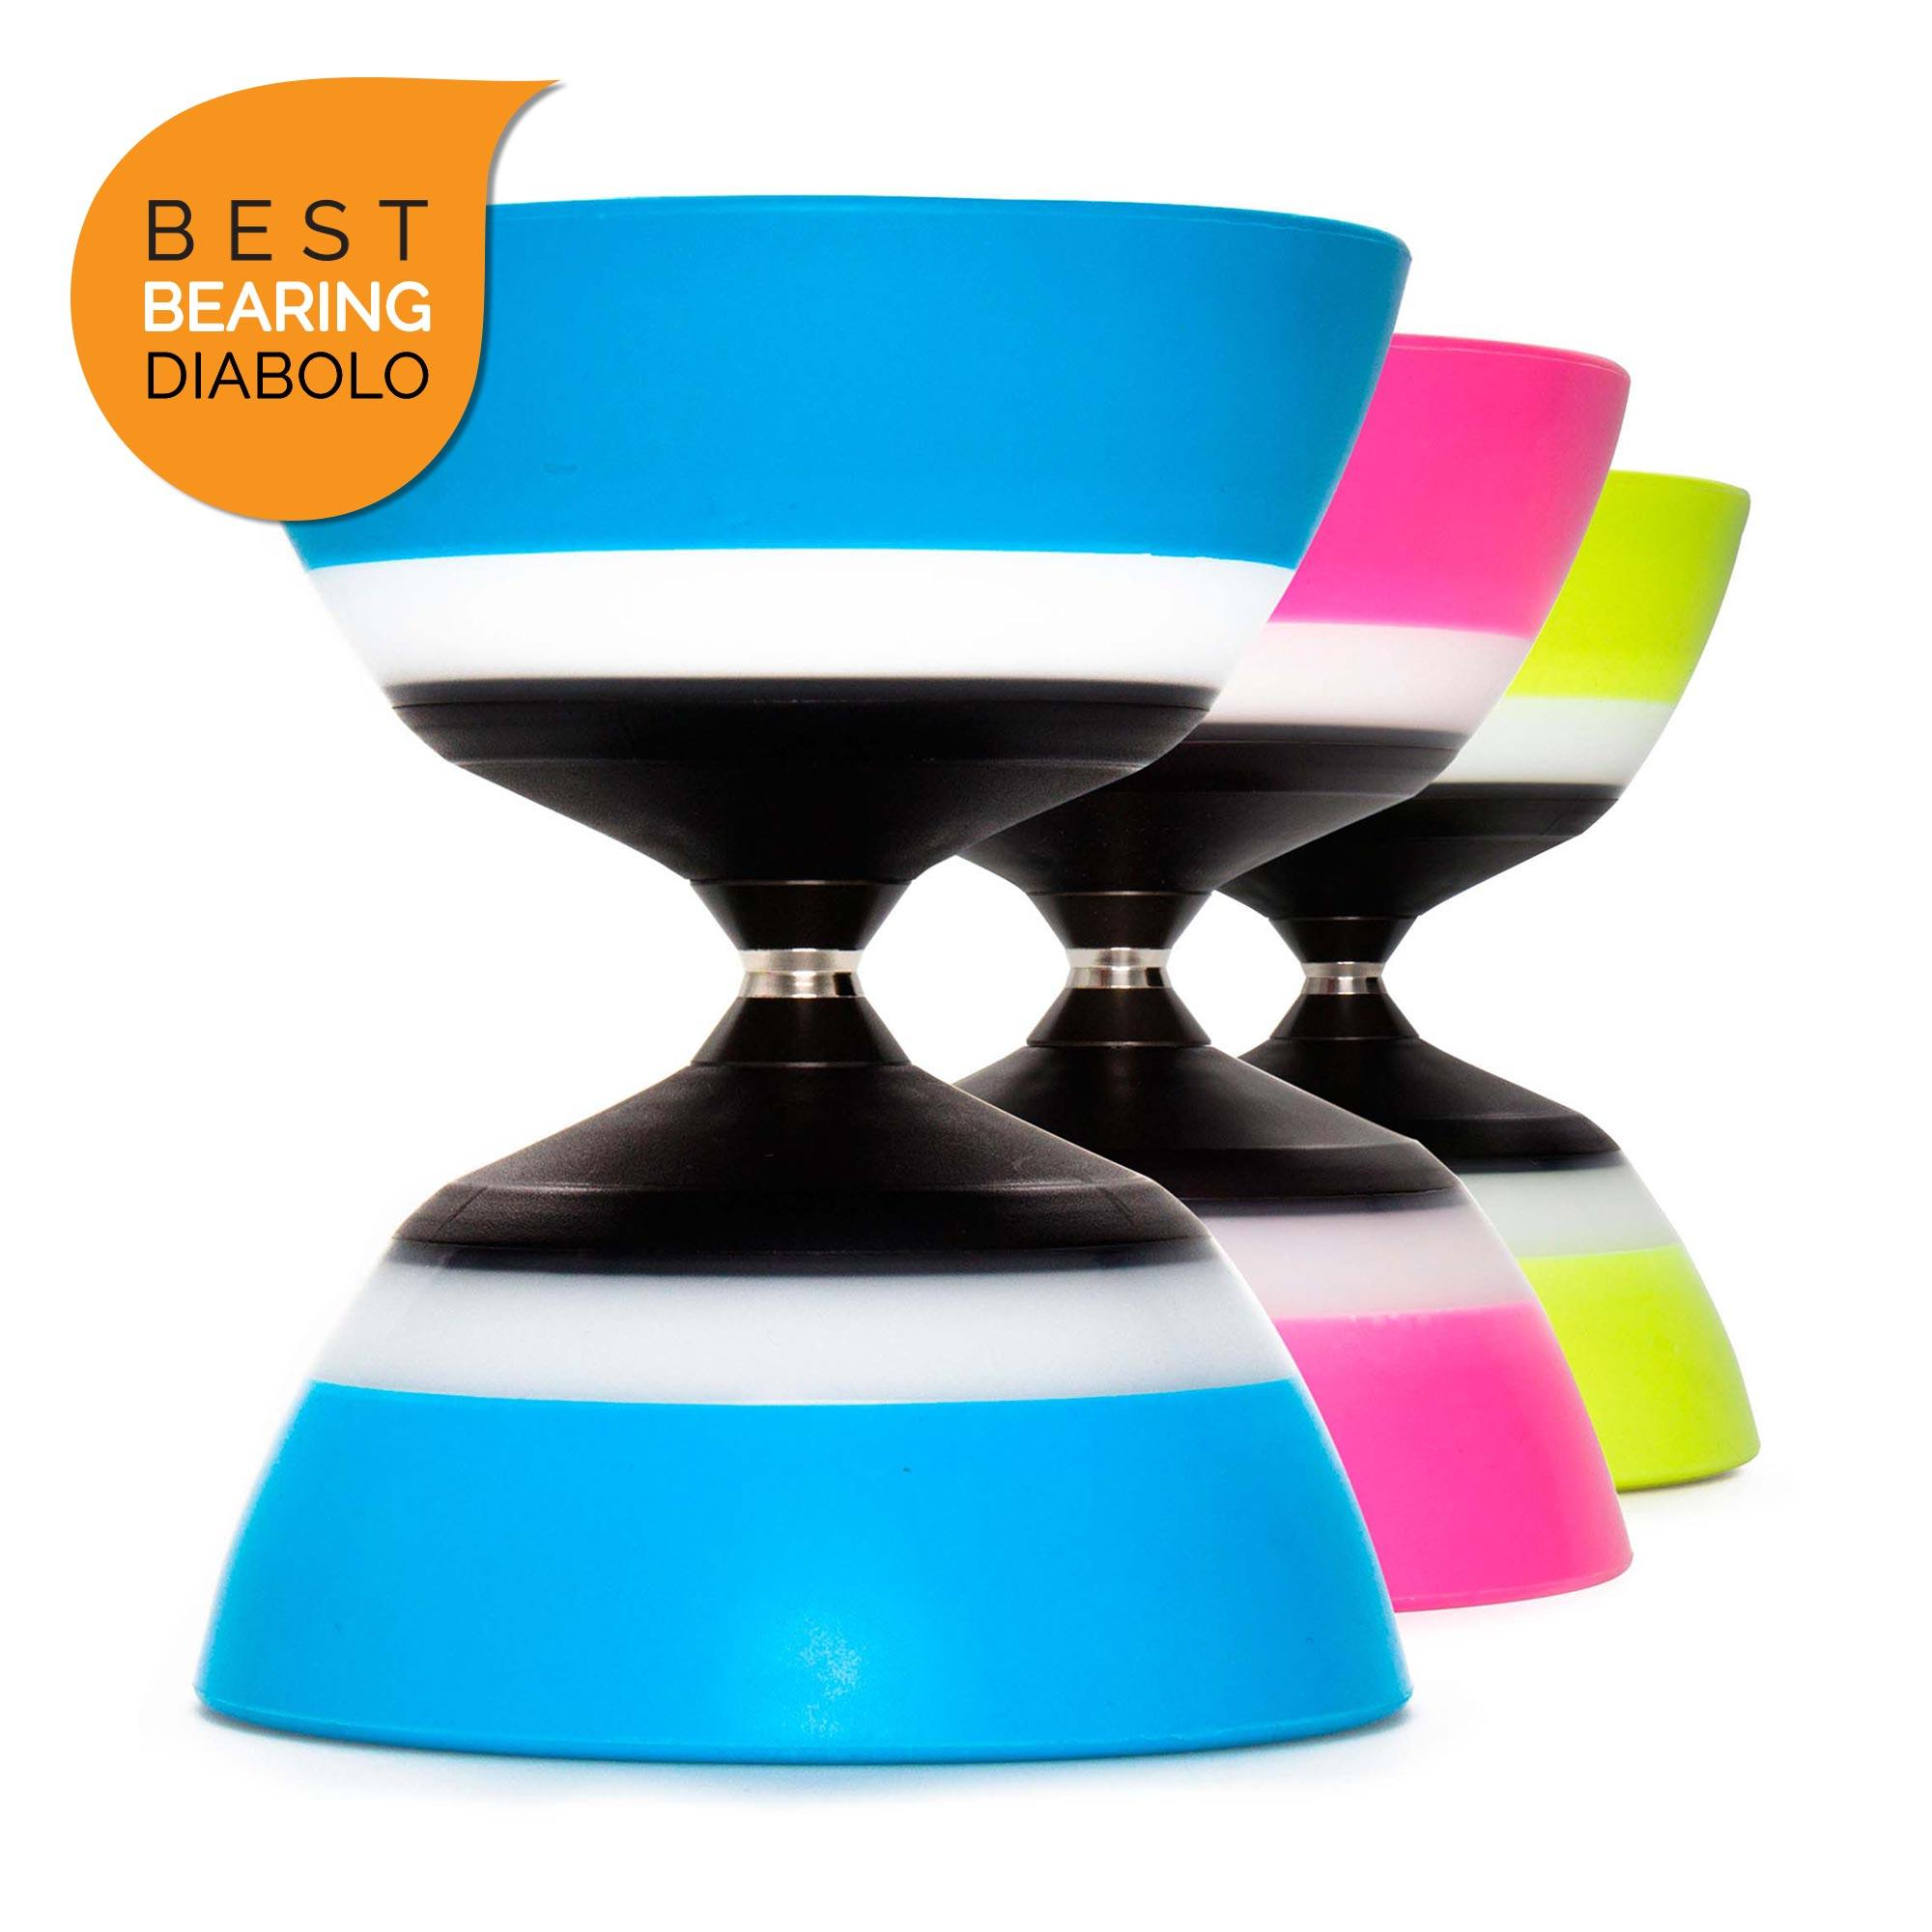 Sundia Evo 5° Diabolo - The Best Large Bearing Axle Diabolo